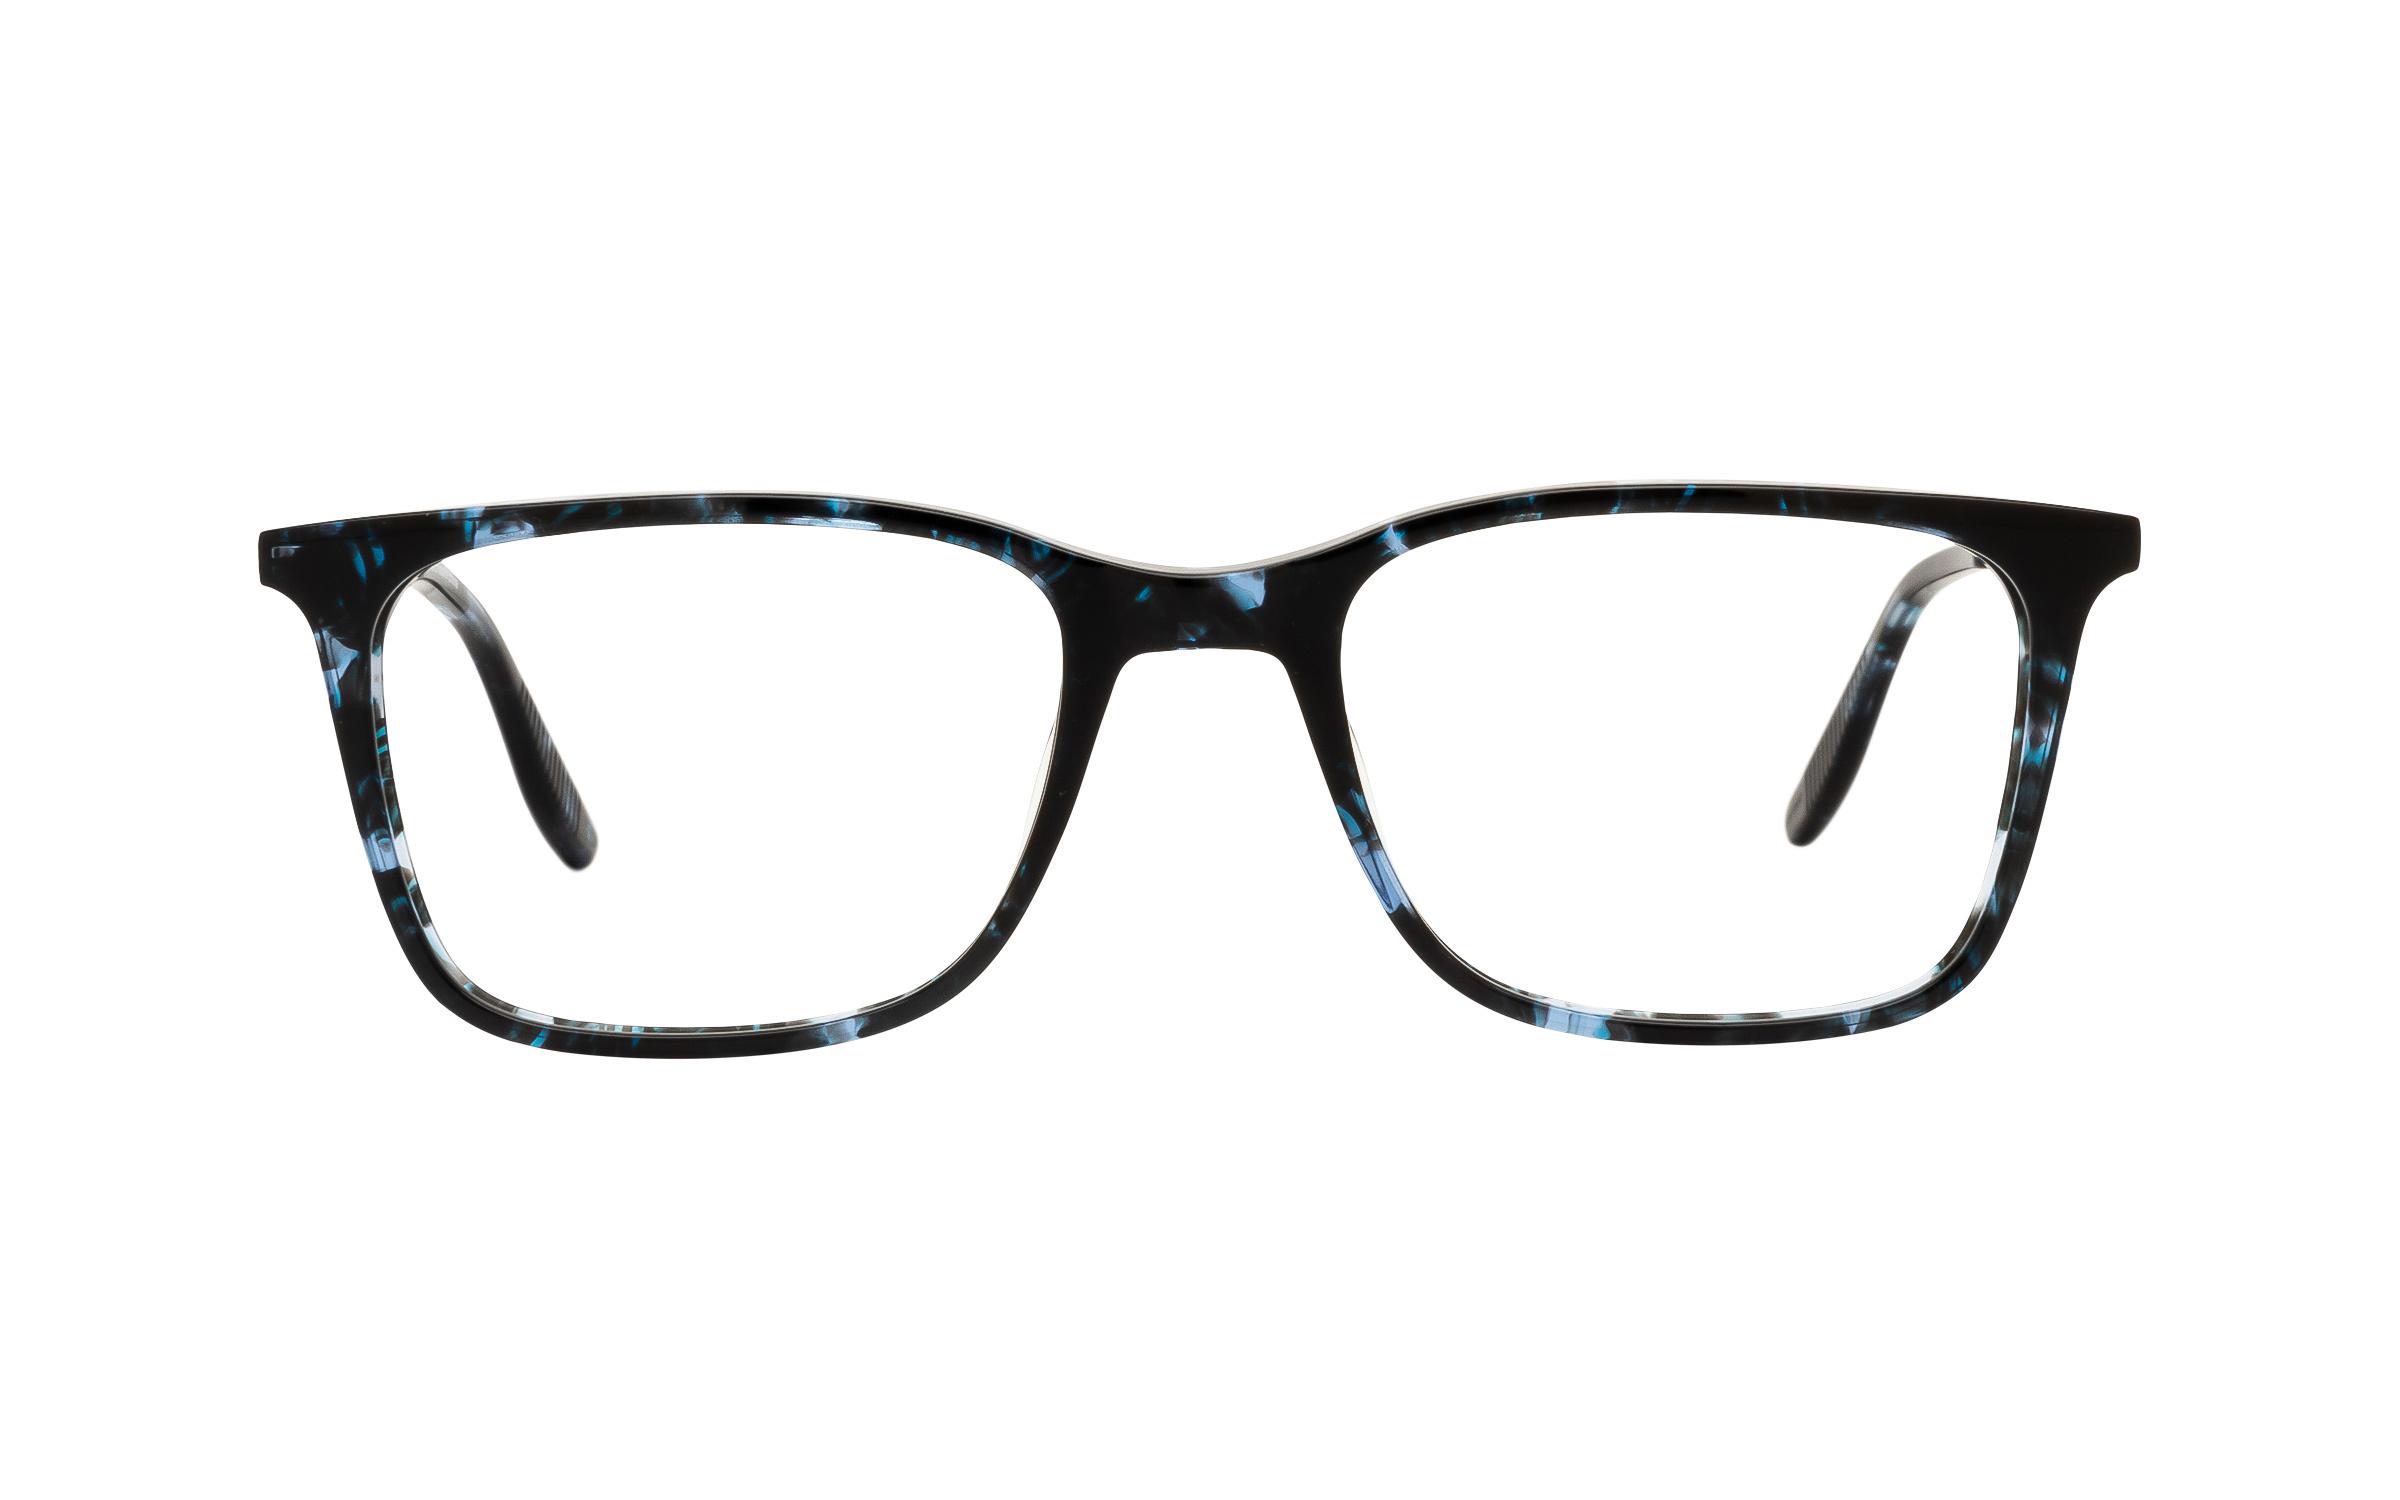 Joseph Marc Men's Boyd JM061 C03 (52) Eyeglasses and Frame in Dark Blue Havana Blue/Tortoise | Acetate/Metal